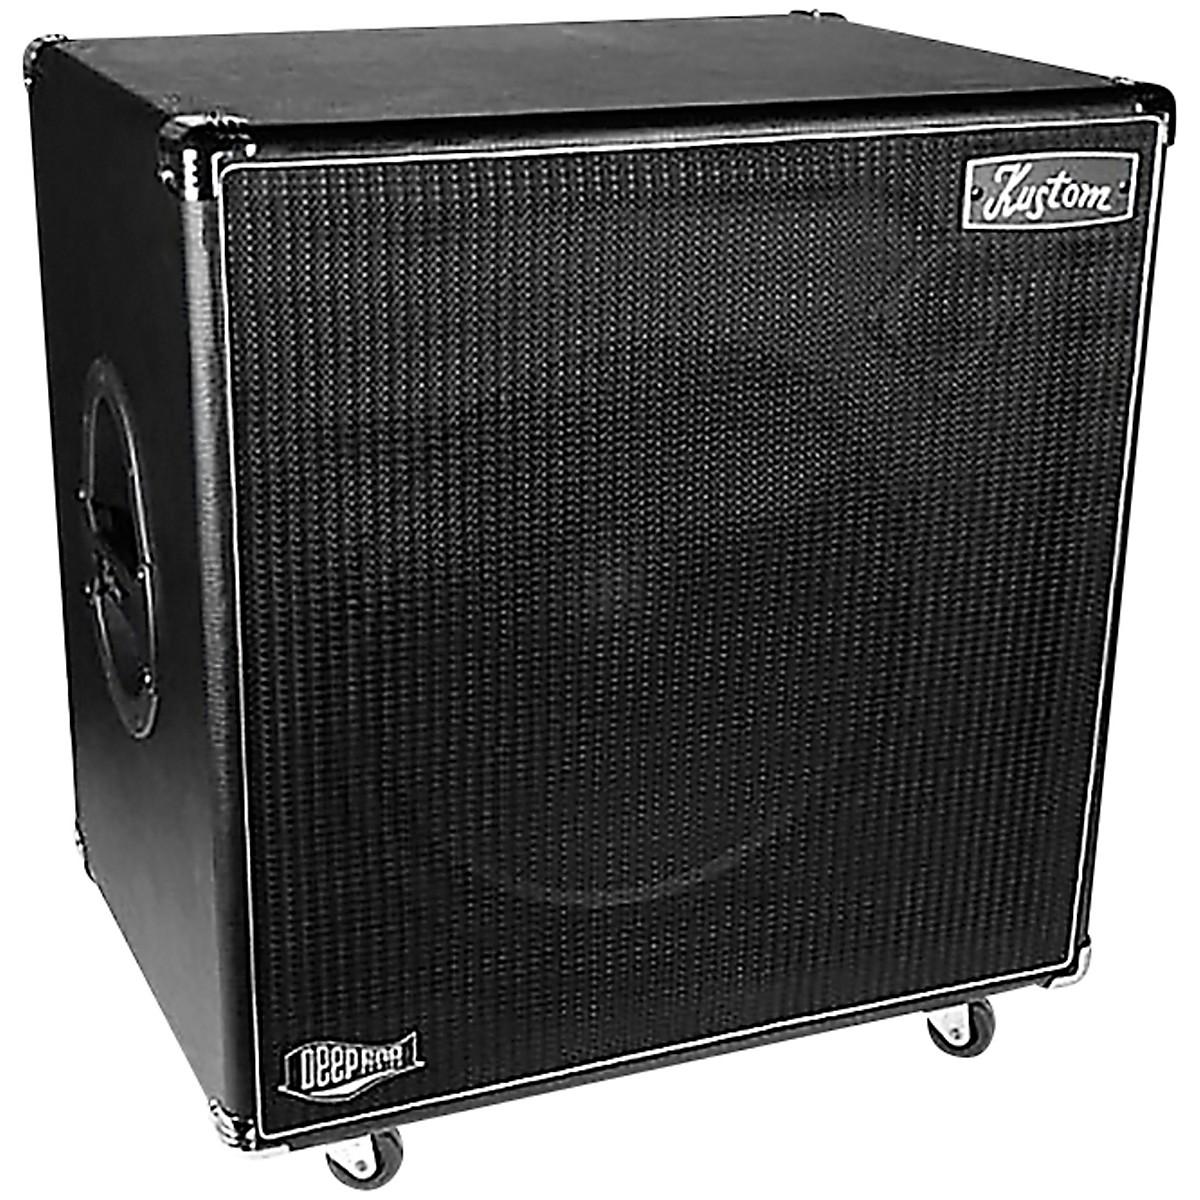 Kustom DEEP115 700W 1x15 Bass Speaker Cabinet